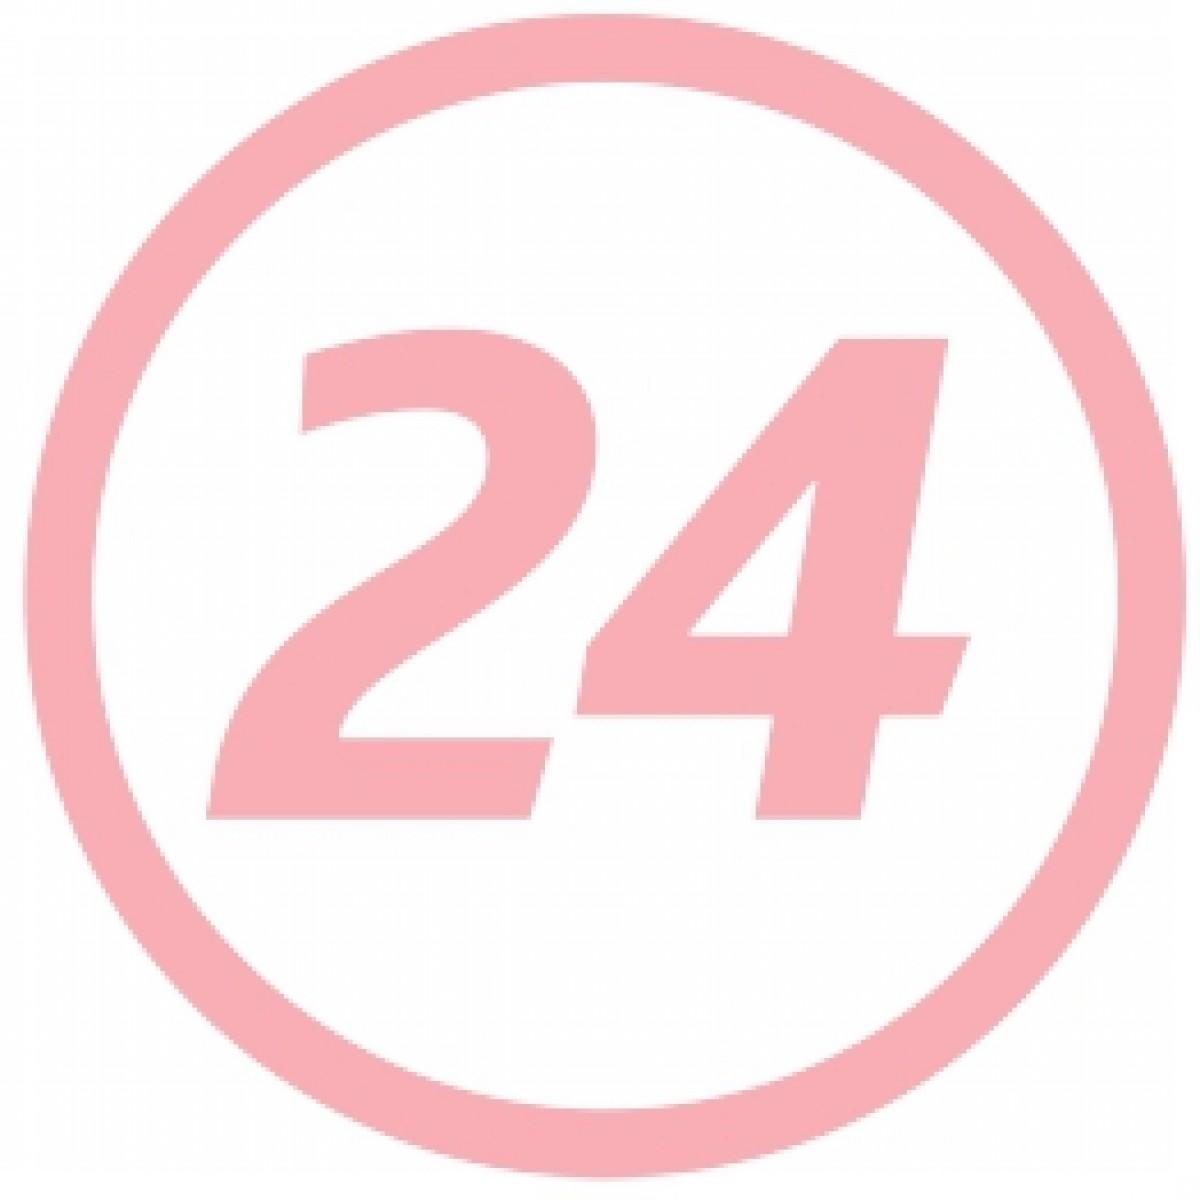 HARTMANN Peha-Crepp Fasa Elastica Pentru Fixare Pansamentelor 12cm x 4m, Fasa, 1buc